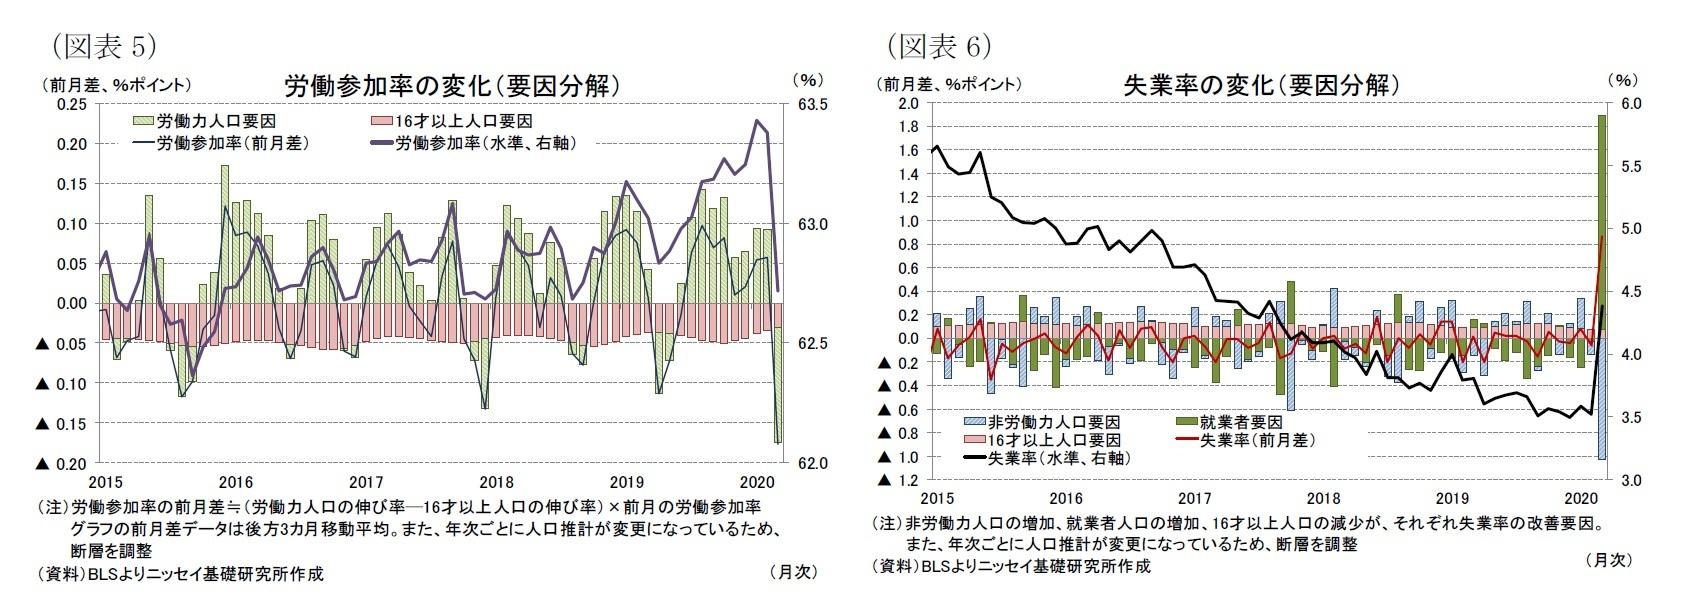 (図表5)労働参加率の変化(要因分解)/(図表6)失業率の変化(要因分解)